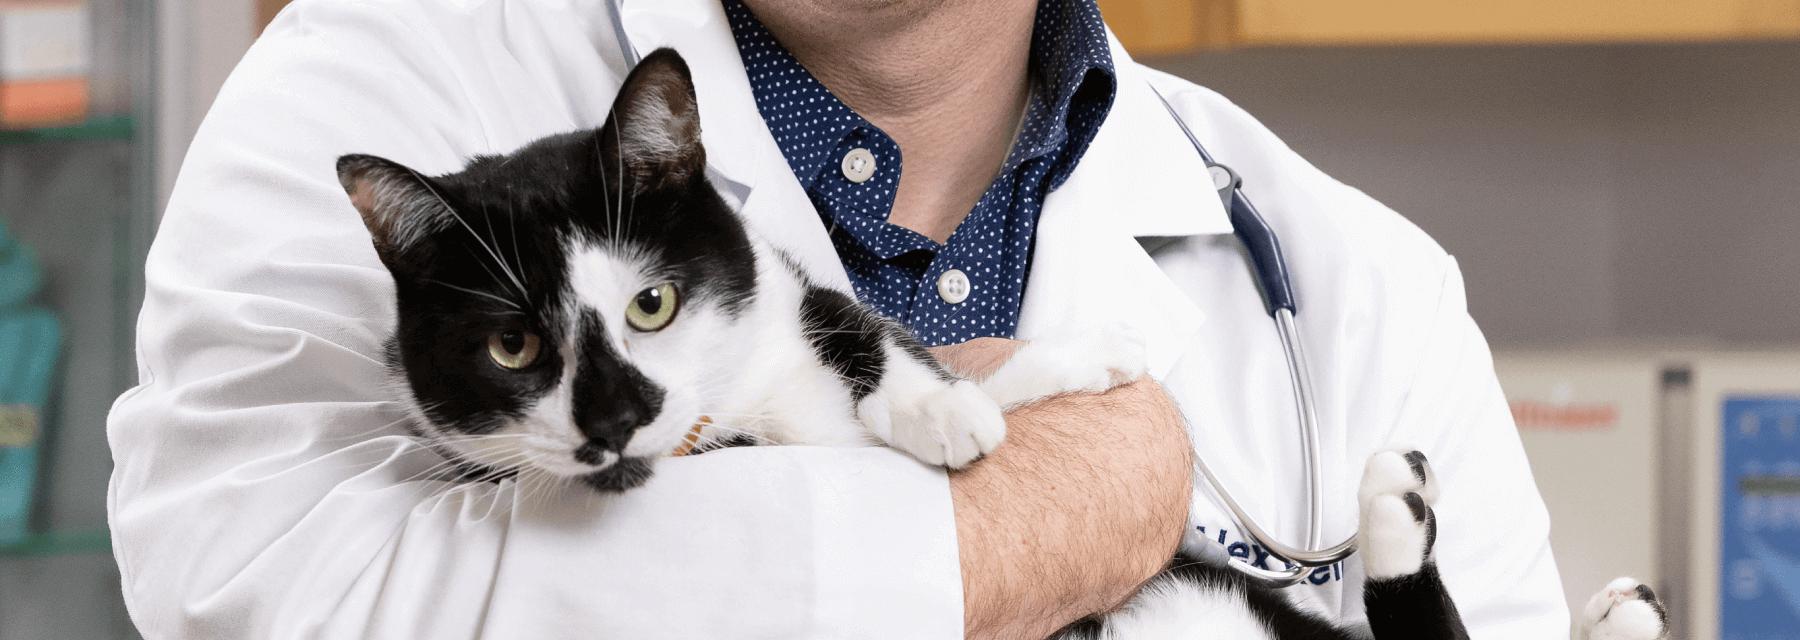 Cancer Diagnosis & Treatment